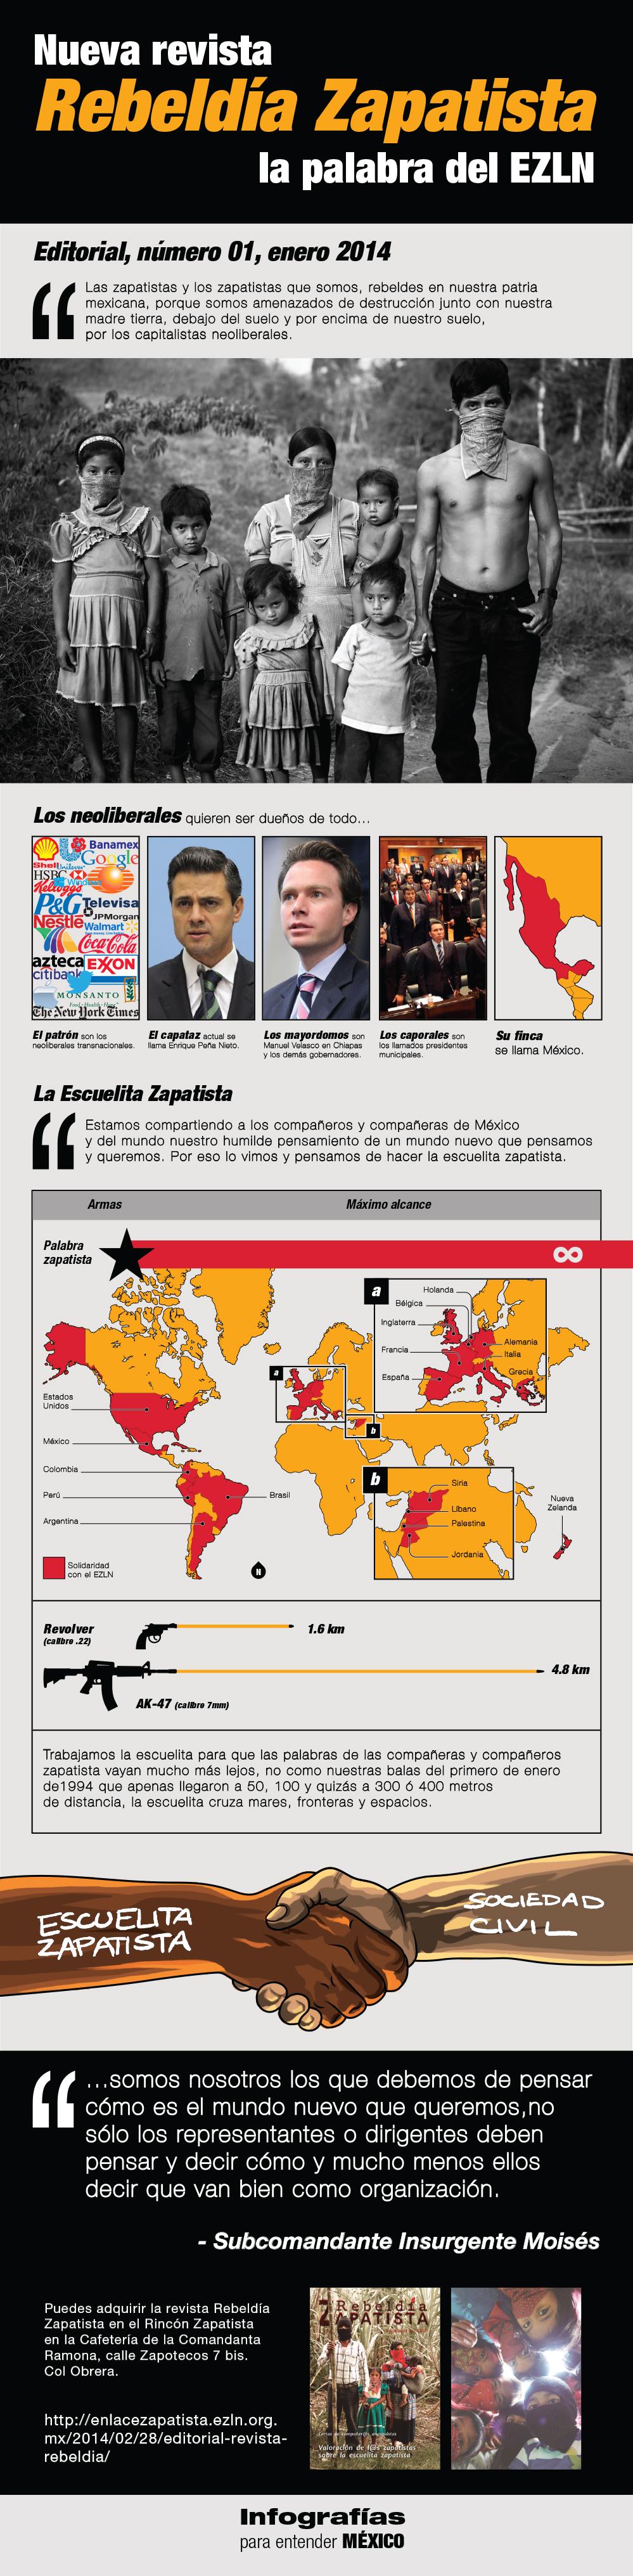 INFOGRAFÍA editorial EZLN 7